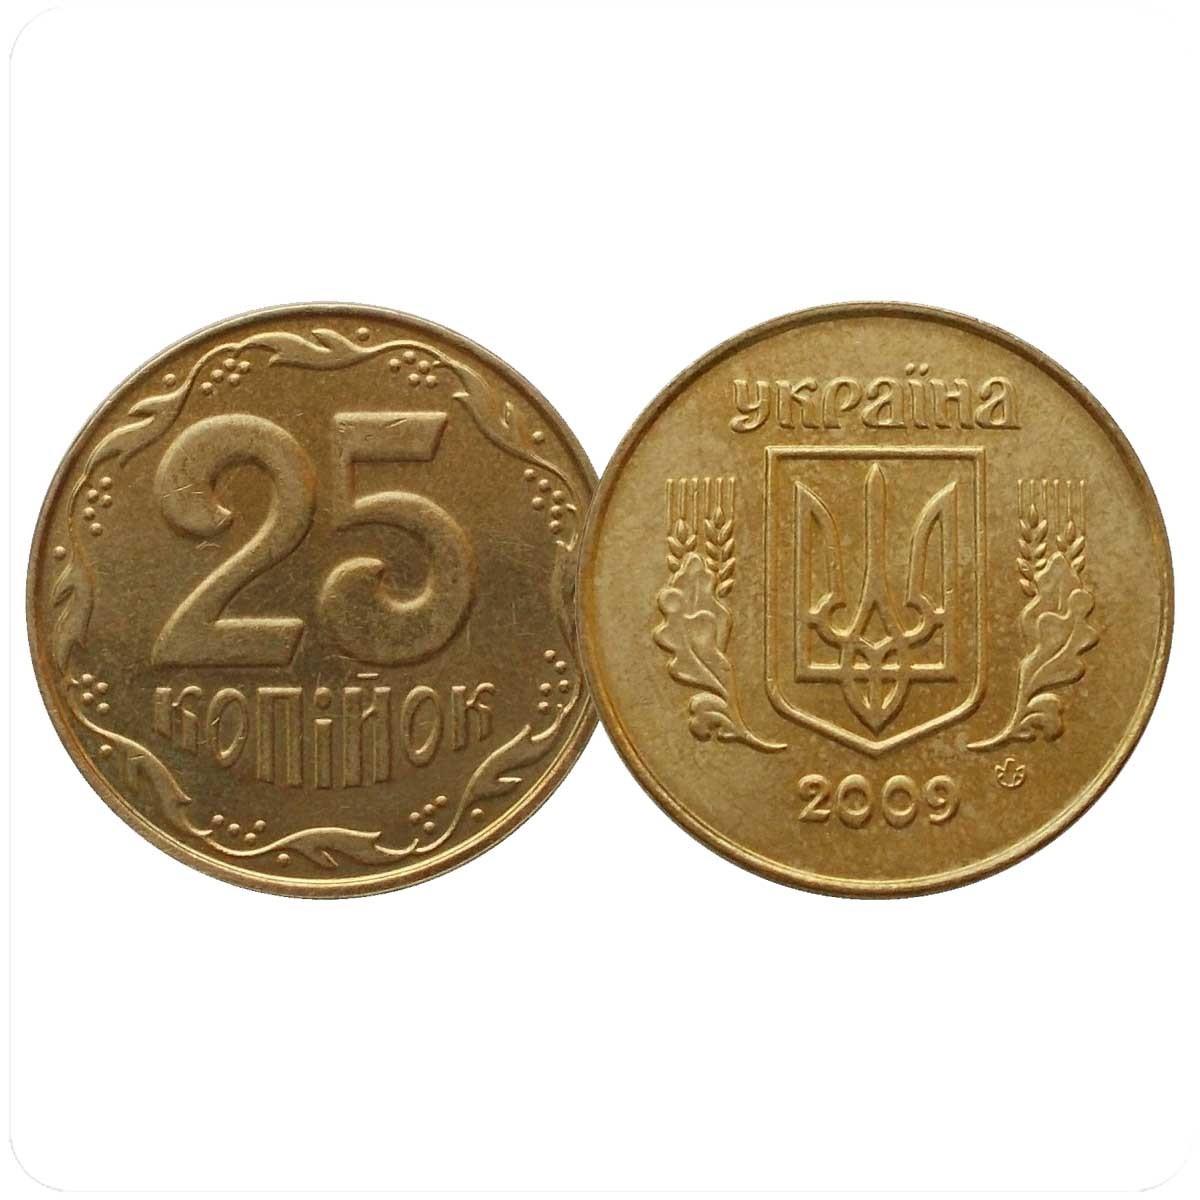 25 копеек ,украина,2009 год нумизматика цены значки